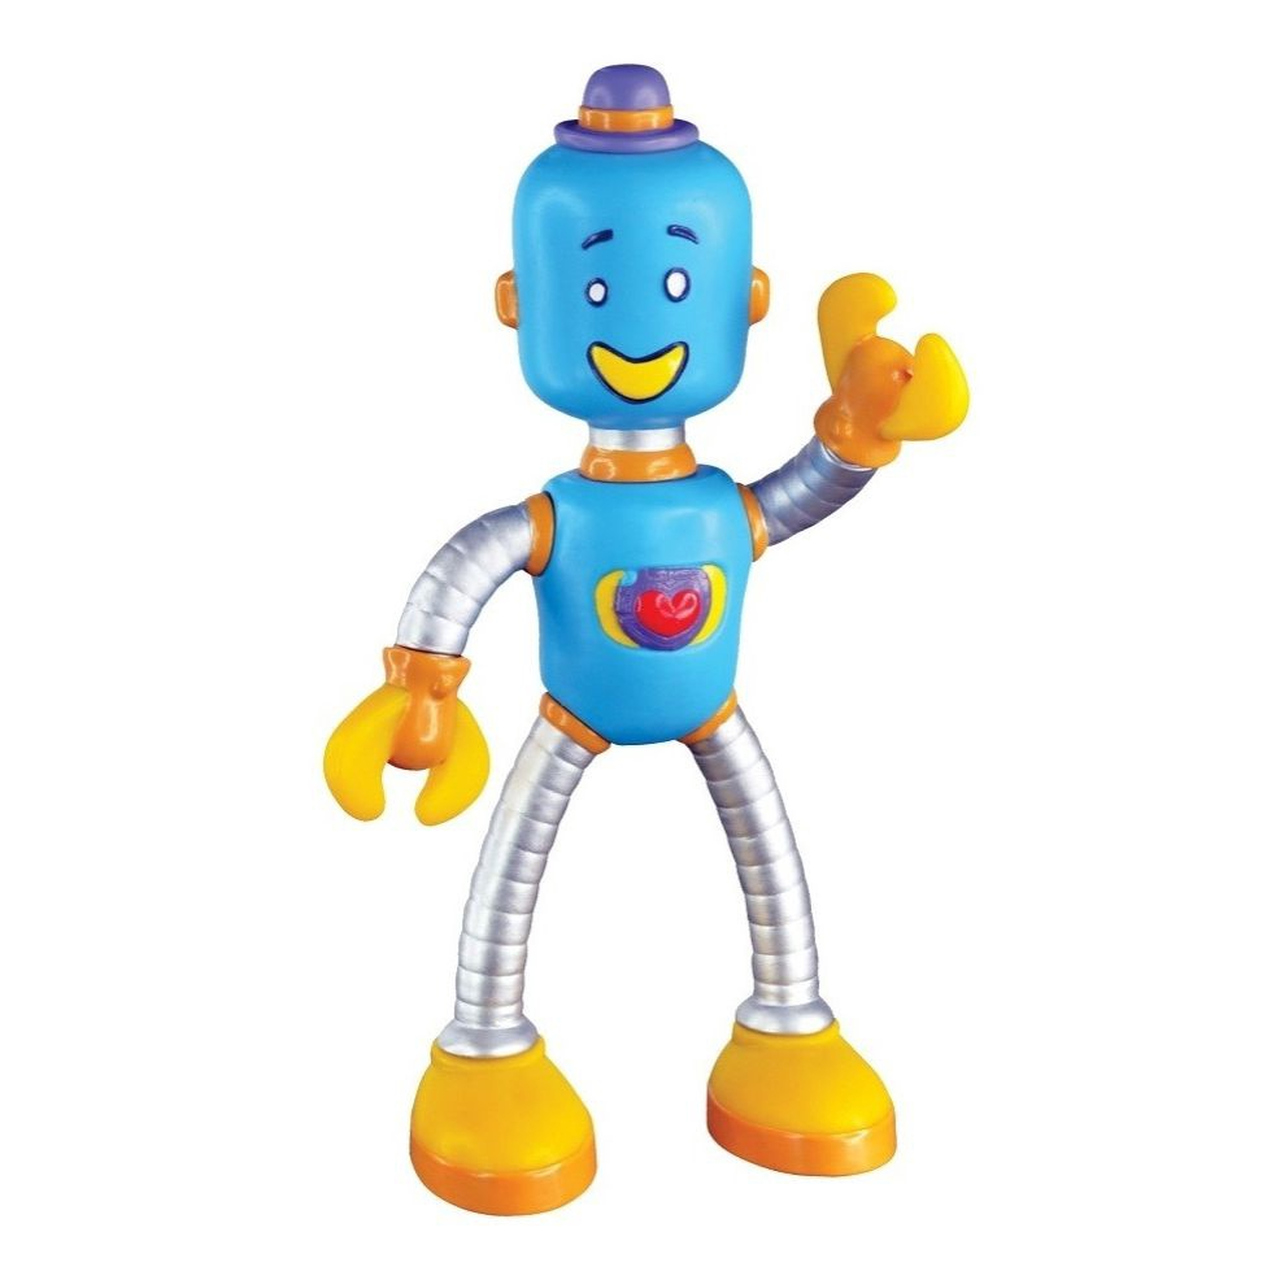 Boneco Vinil Robô Tum Tum Mundo Bita Oficial Lider Brinquedos